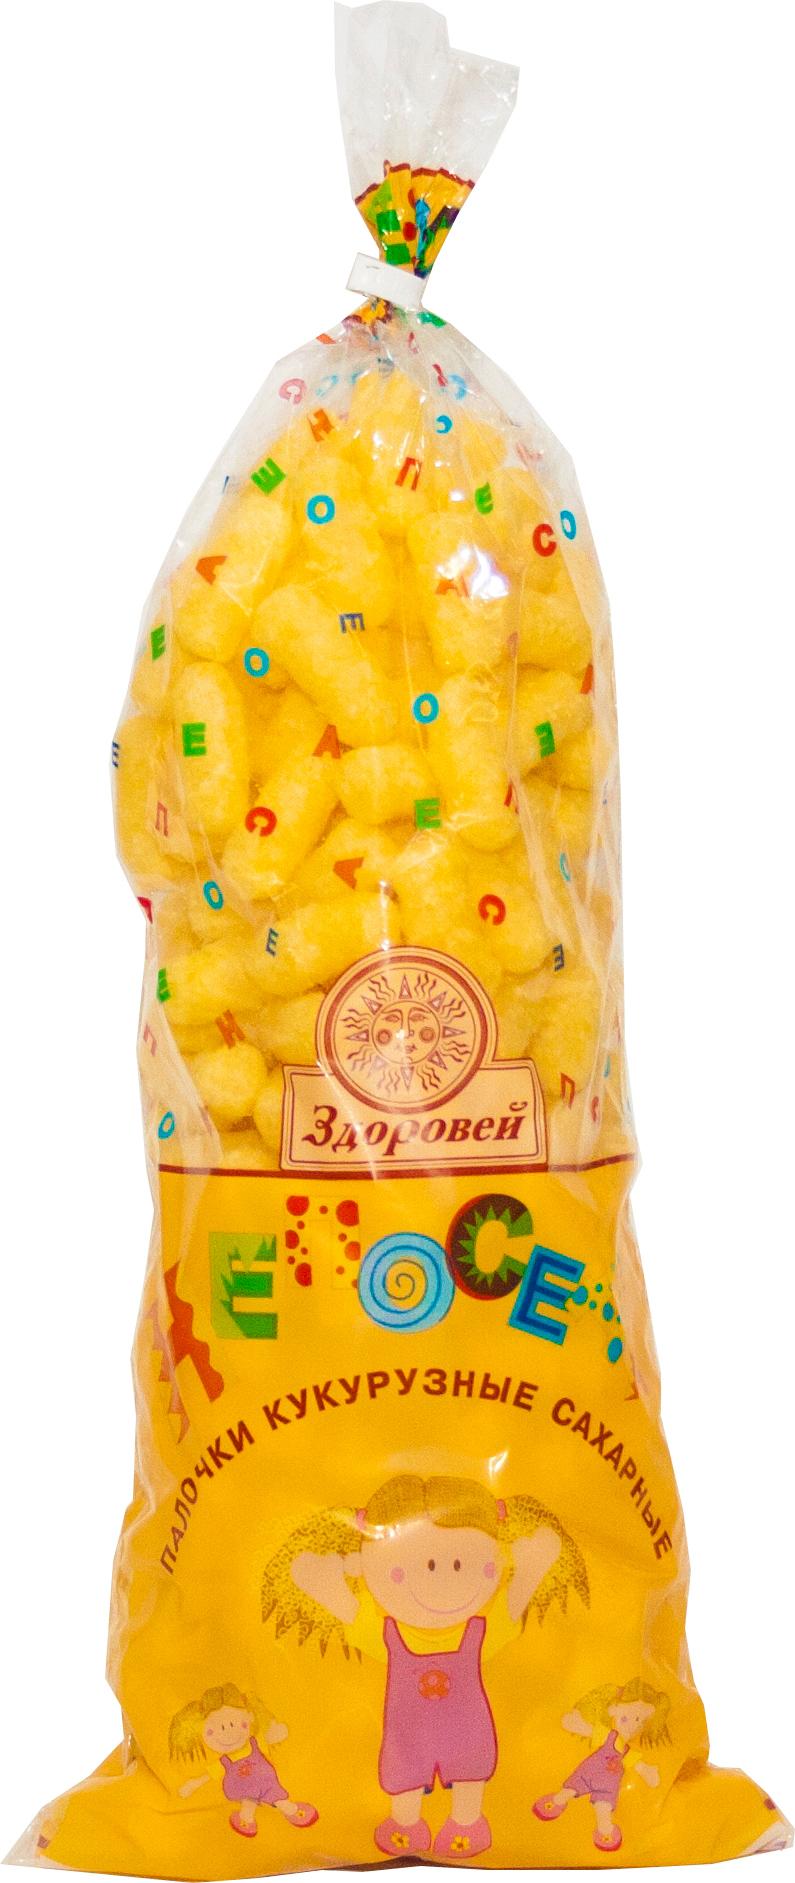 cheetos кукурузные снеки cheetos сыр 85г Непоседа палочки сахарные кукурузные, 100 г